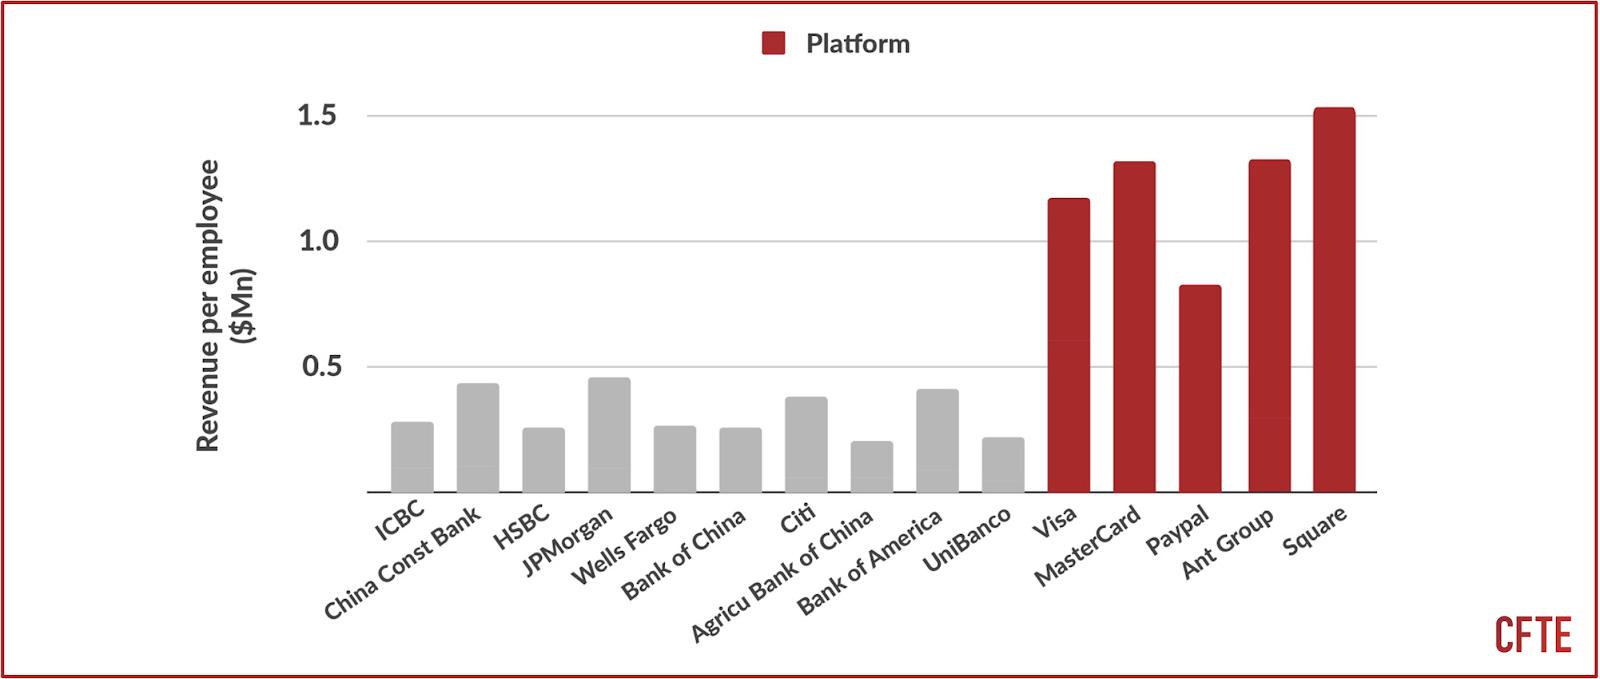 a graphs that shows the revenue per employee for platform vs non-platform financial institutions.